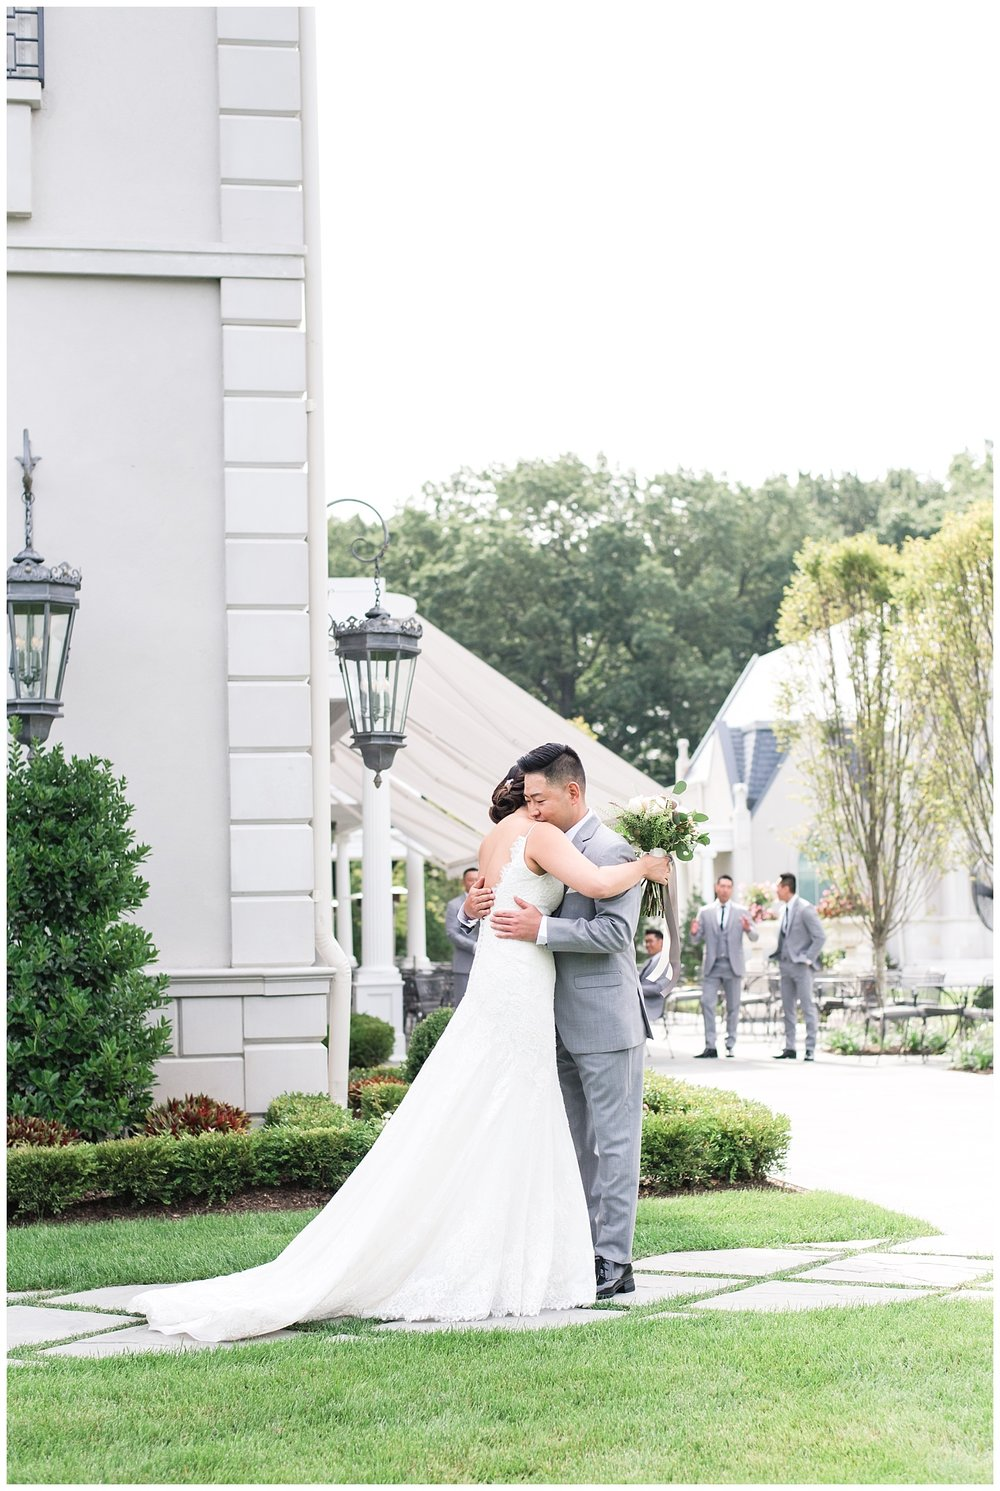 park-chateau-wedding-fabiana-skubic-photography (18).jpg